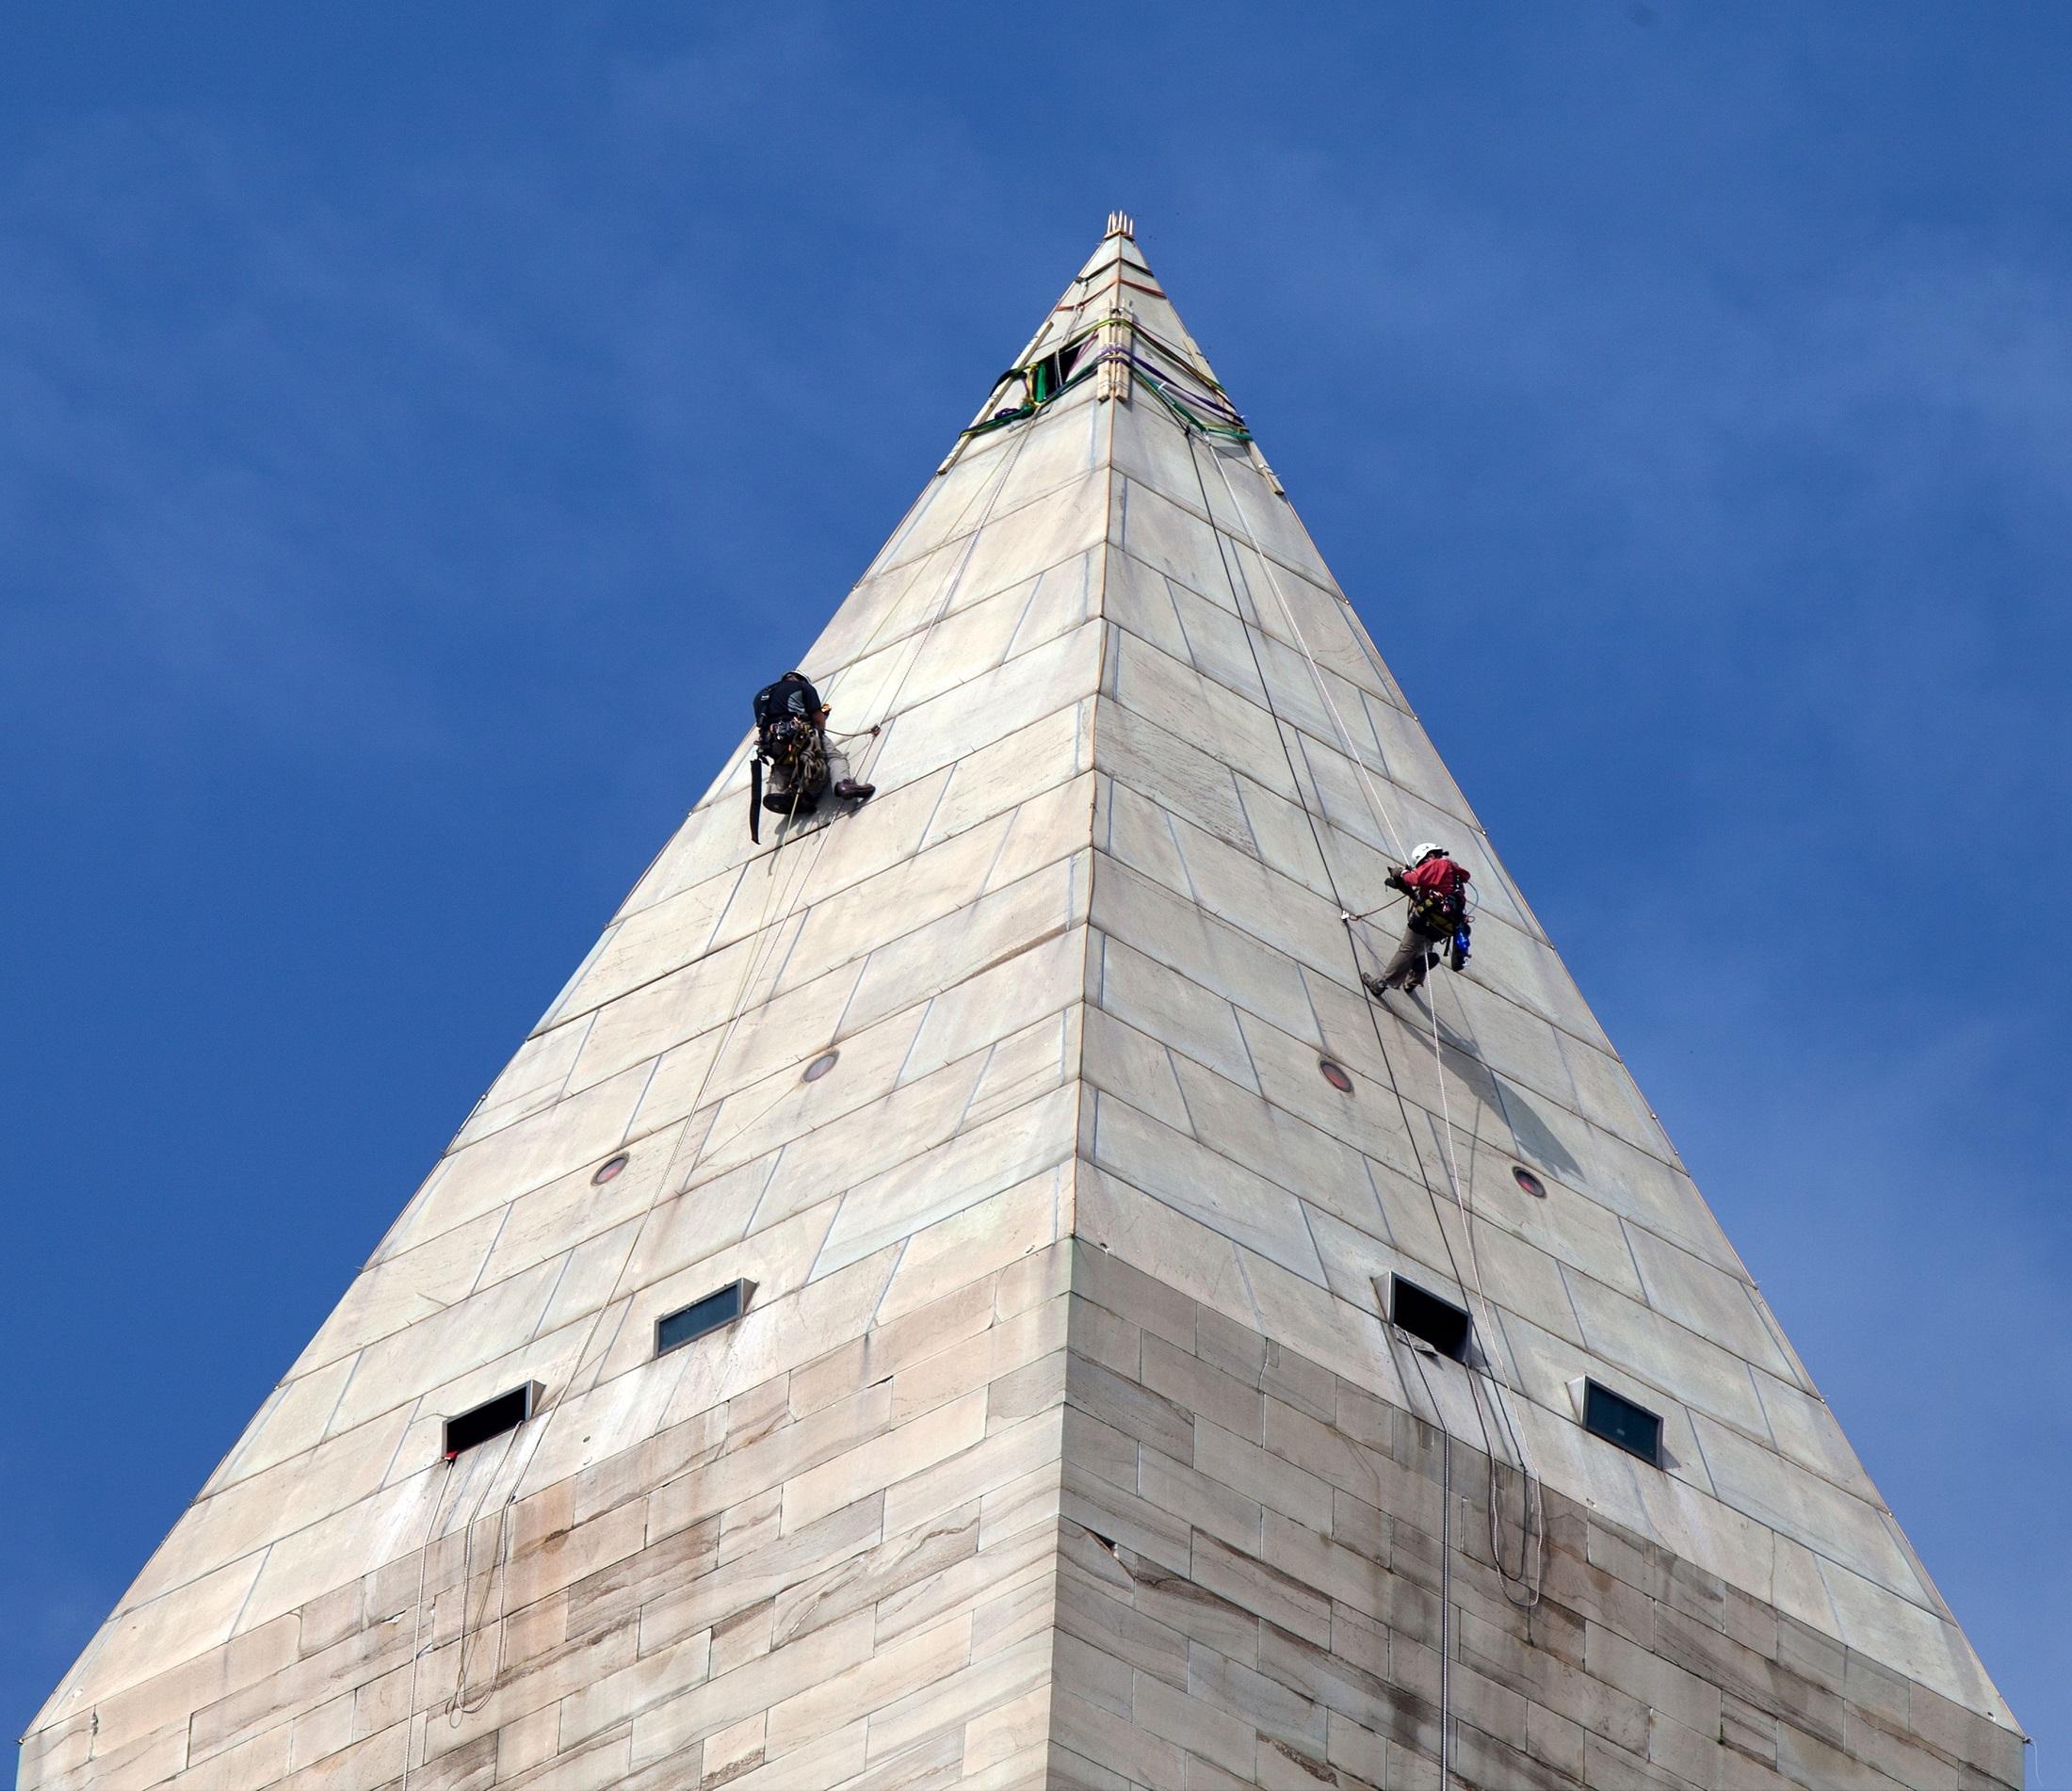 Fotos gratis : arquitectura, cielo, torre, símbolo, Estados Unidos ...